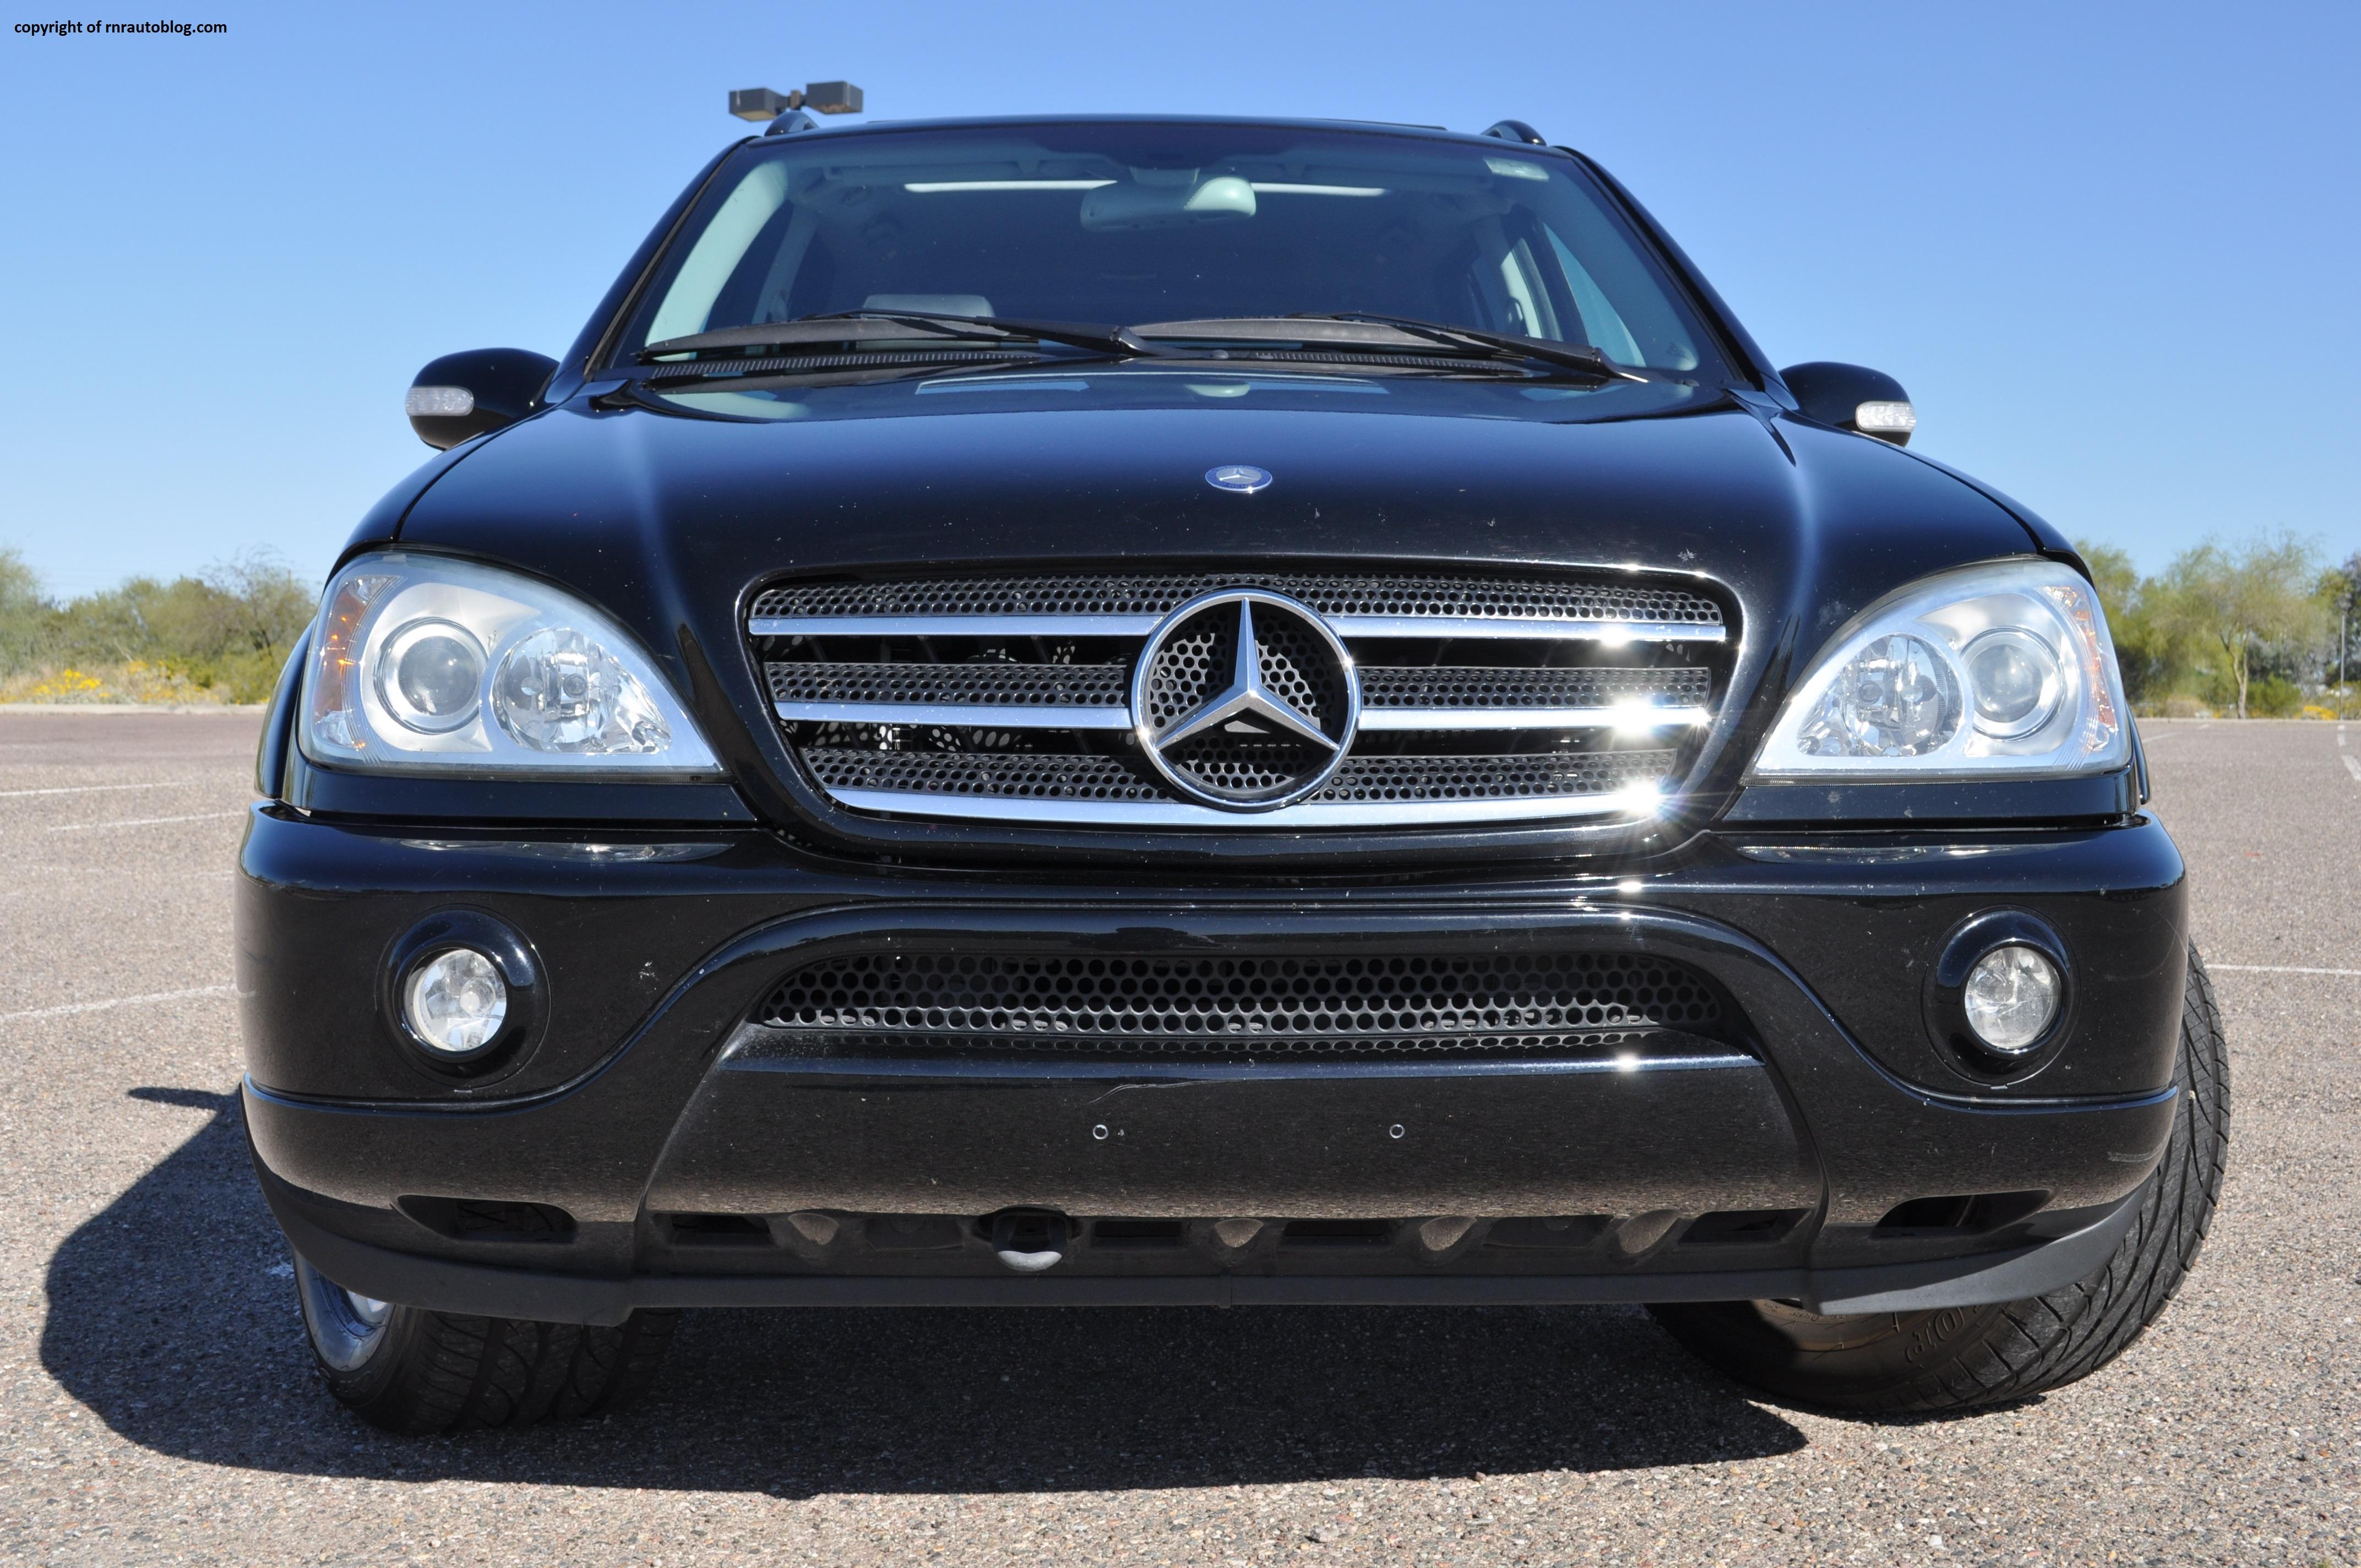 2004 mercedes benz ml500 review rnr automotive blog for Mercedes benz ml430